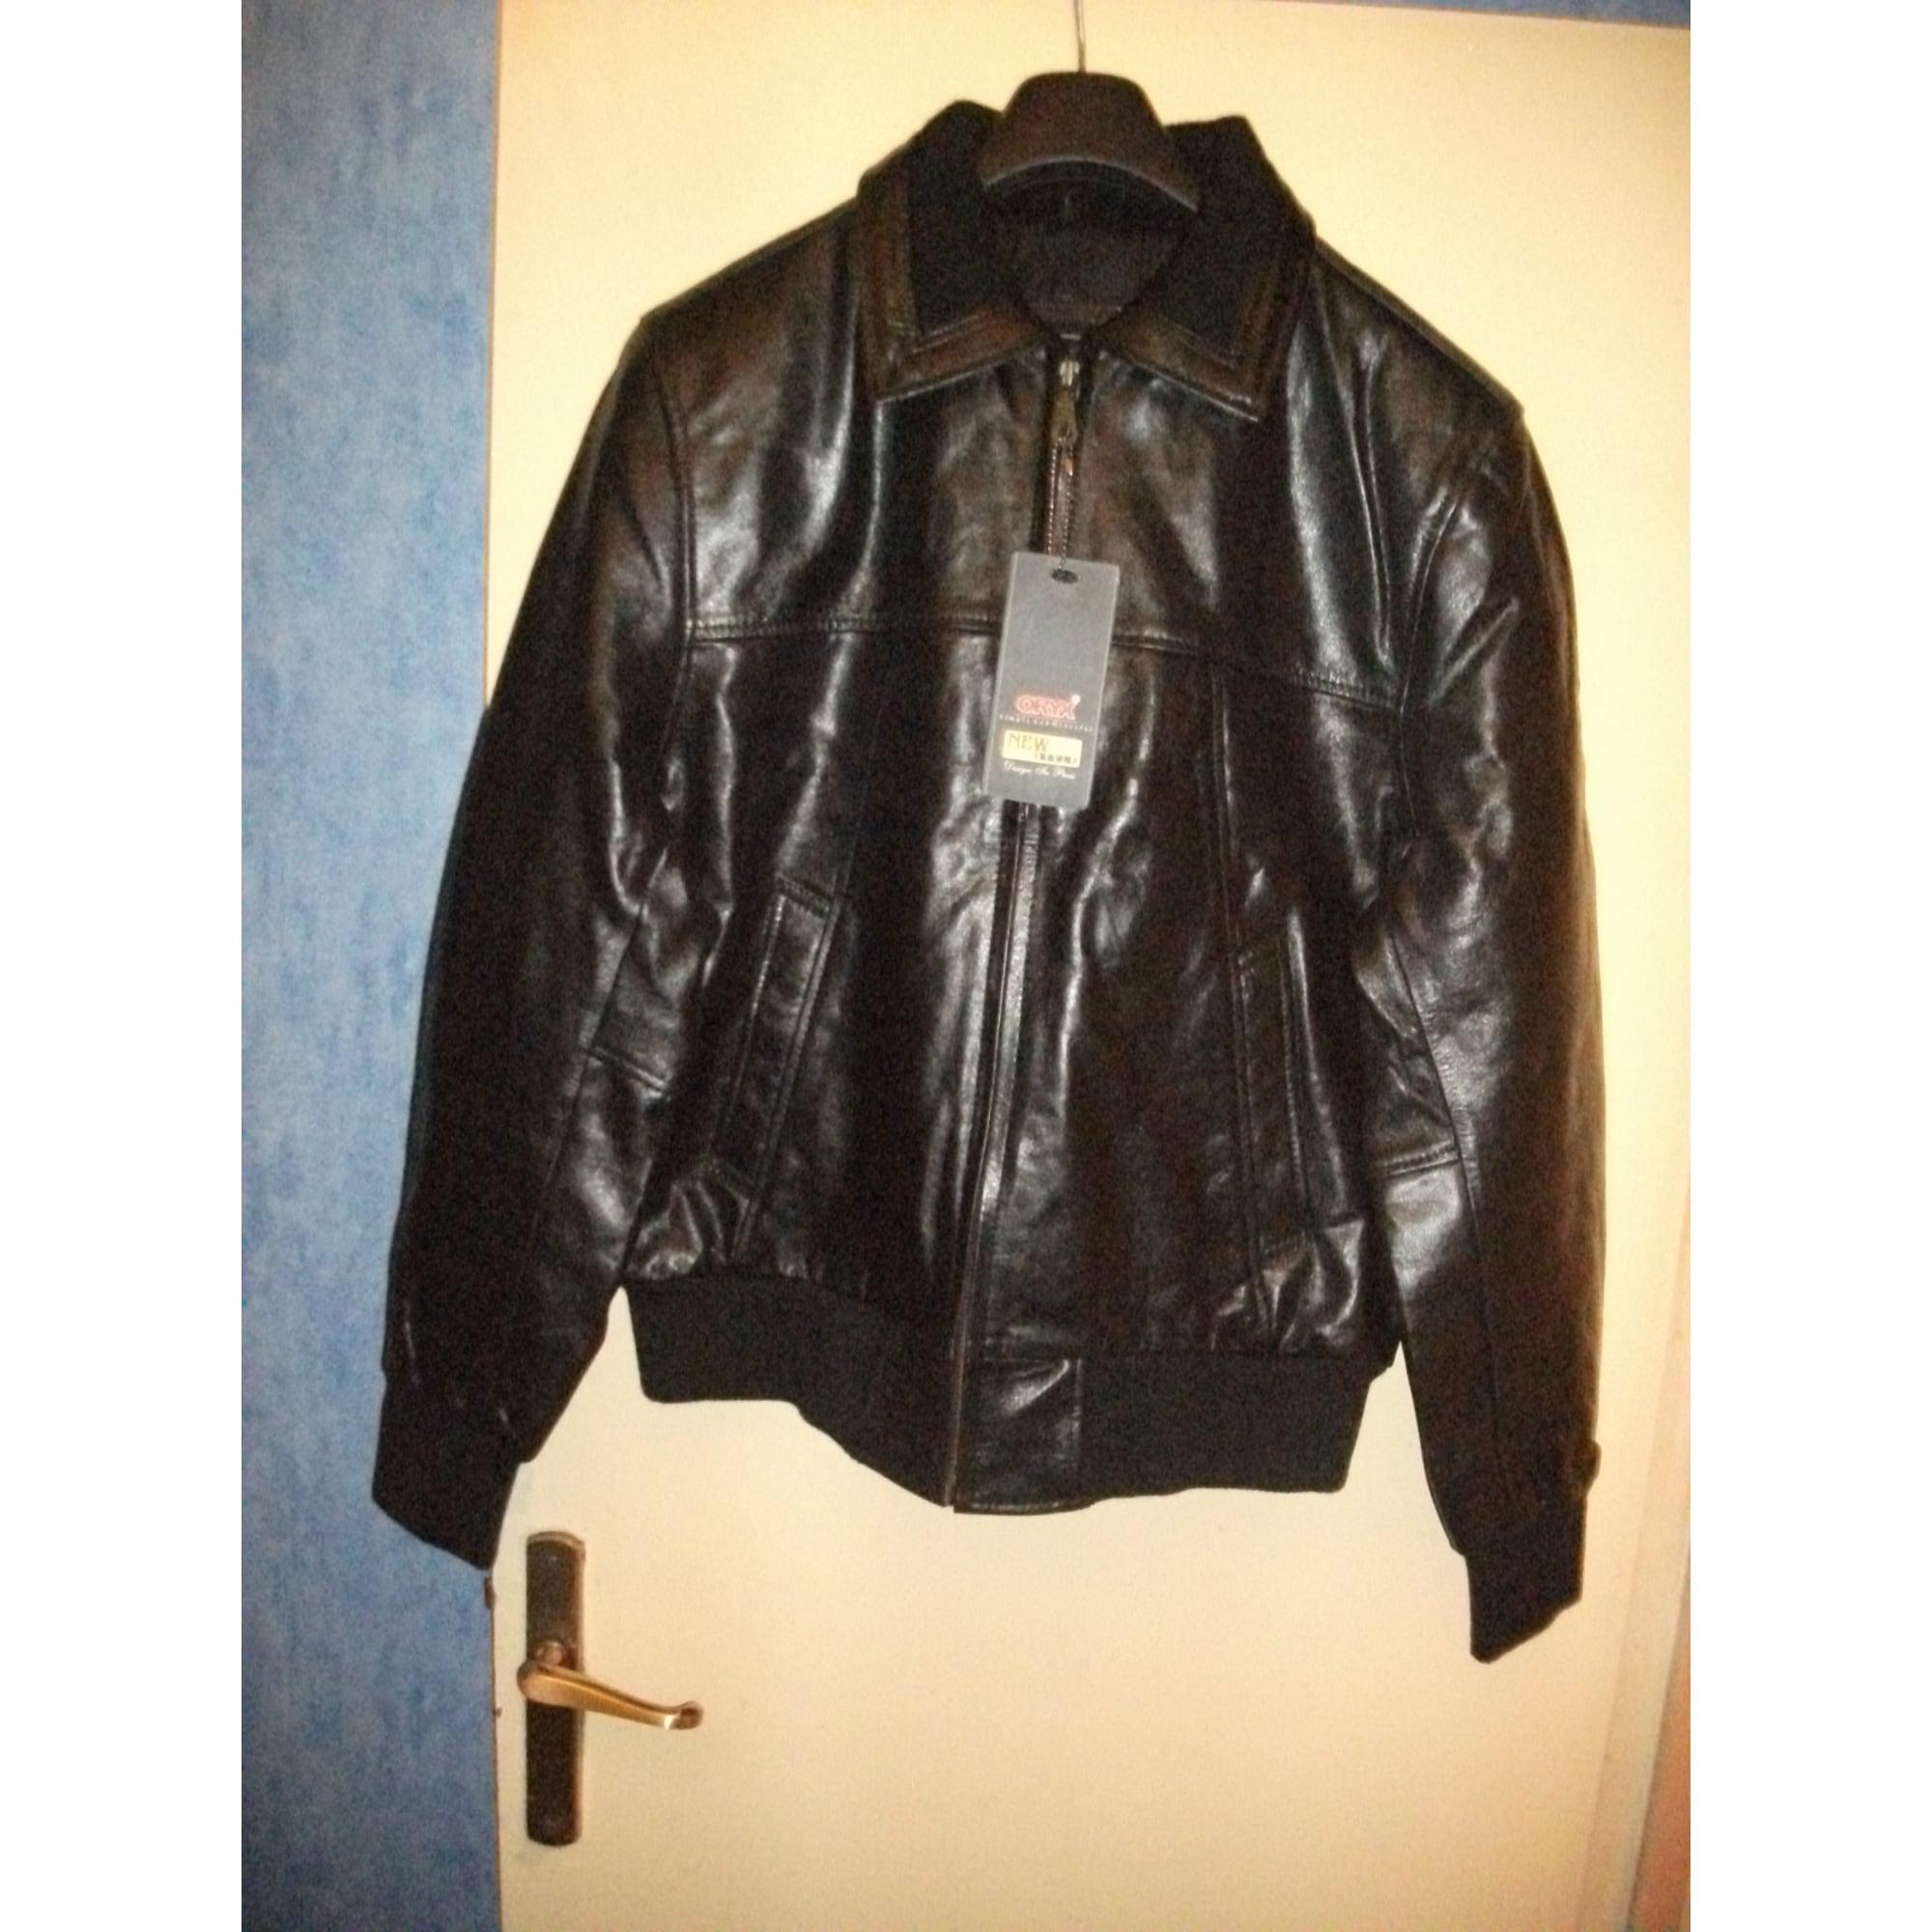 37235f6b10c3 Blouson en cuir ORYX 56 (XL) noir - 1985073